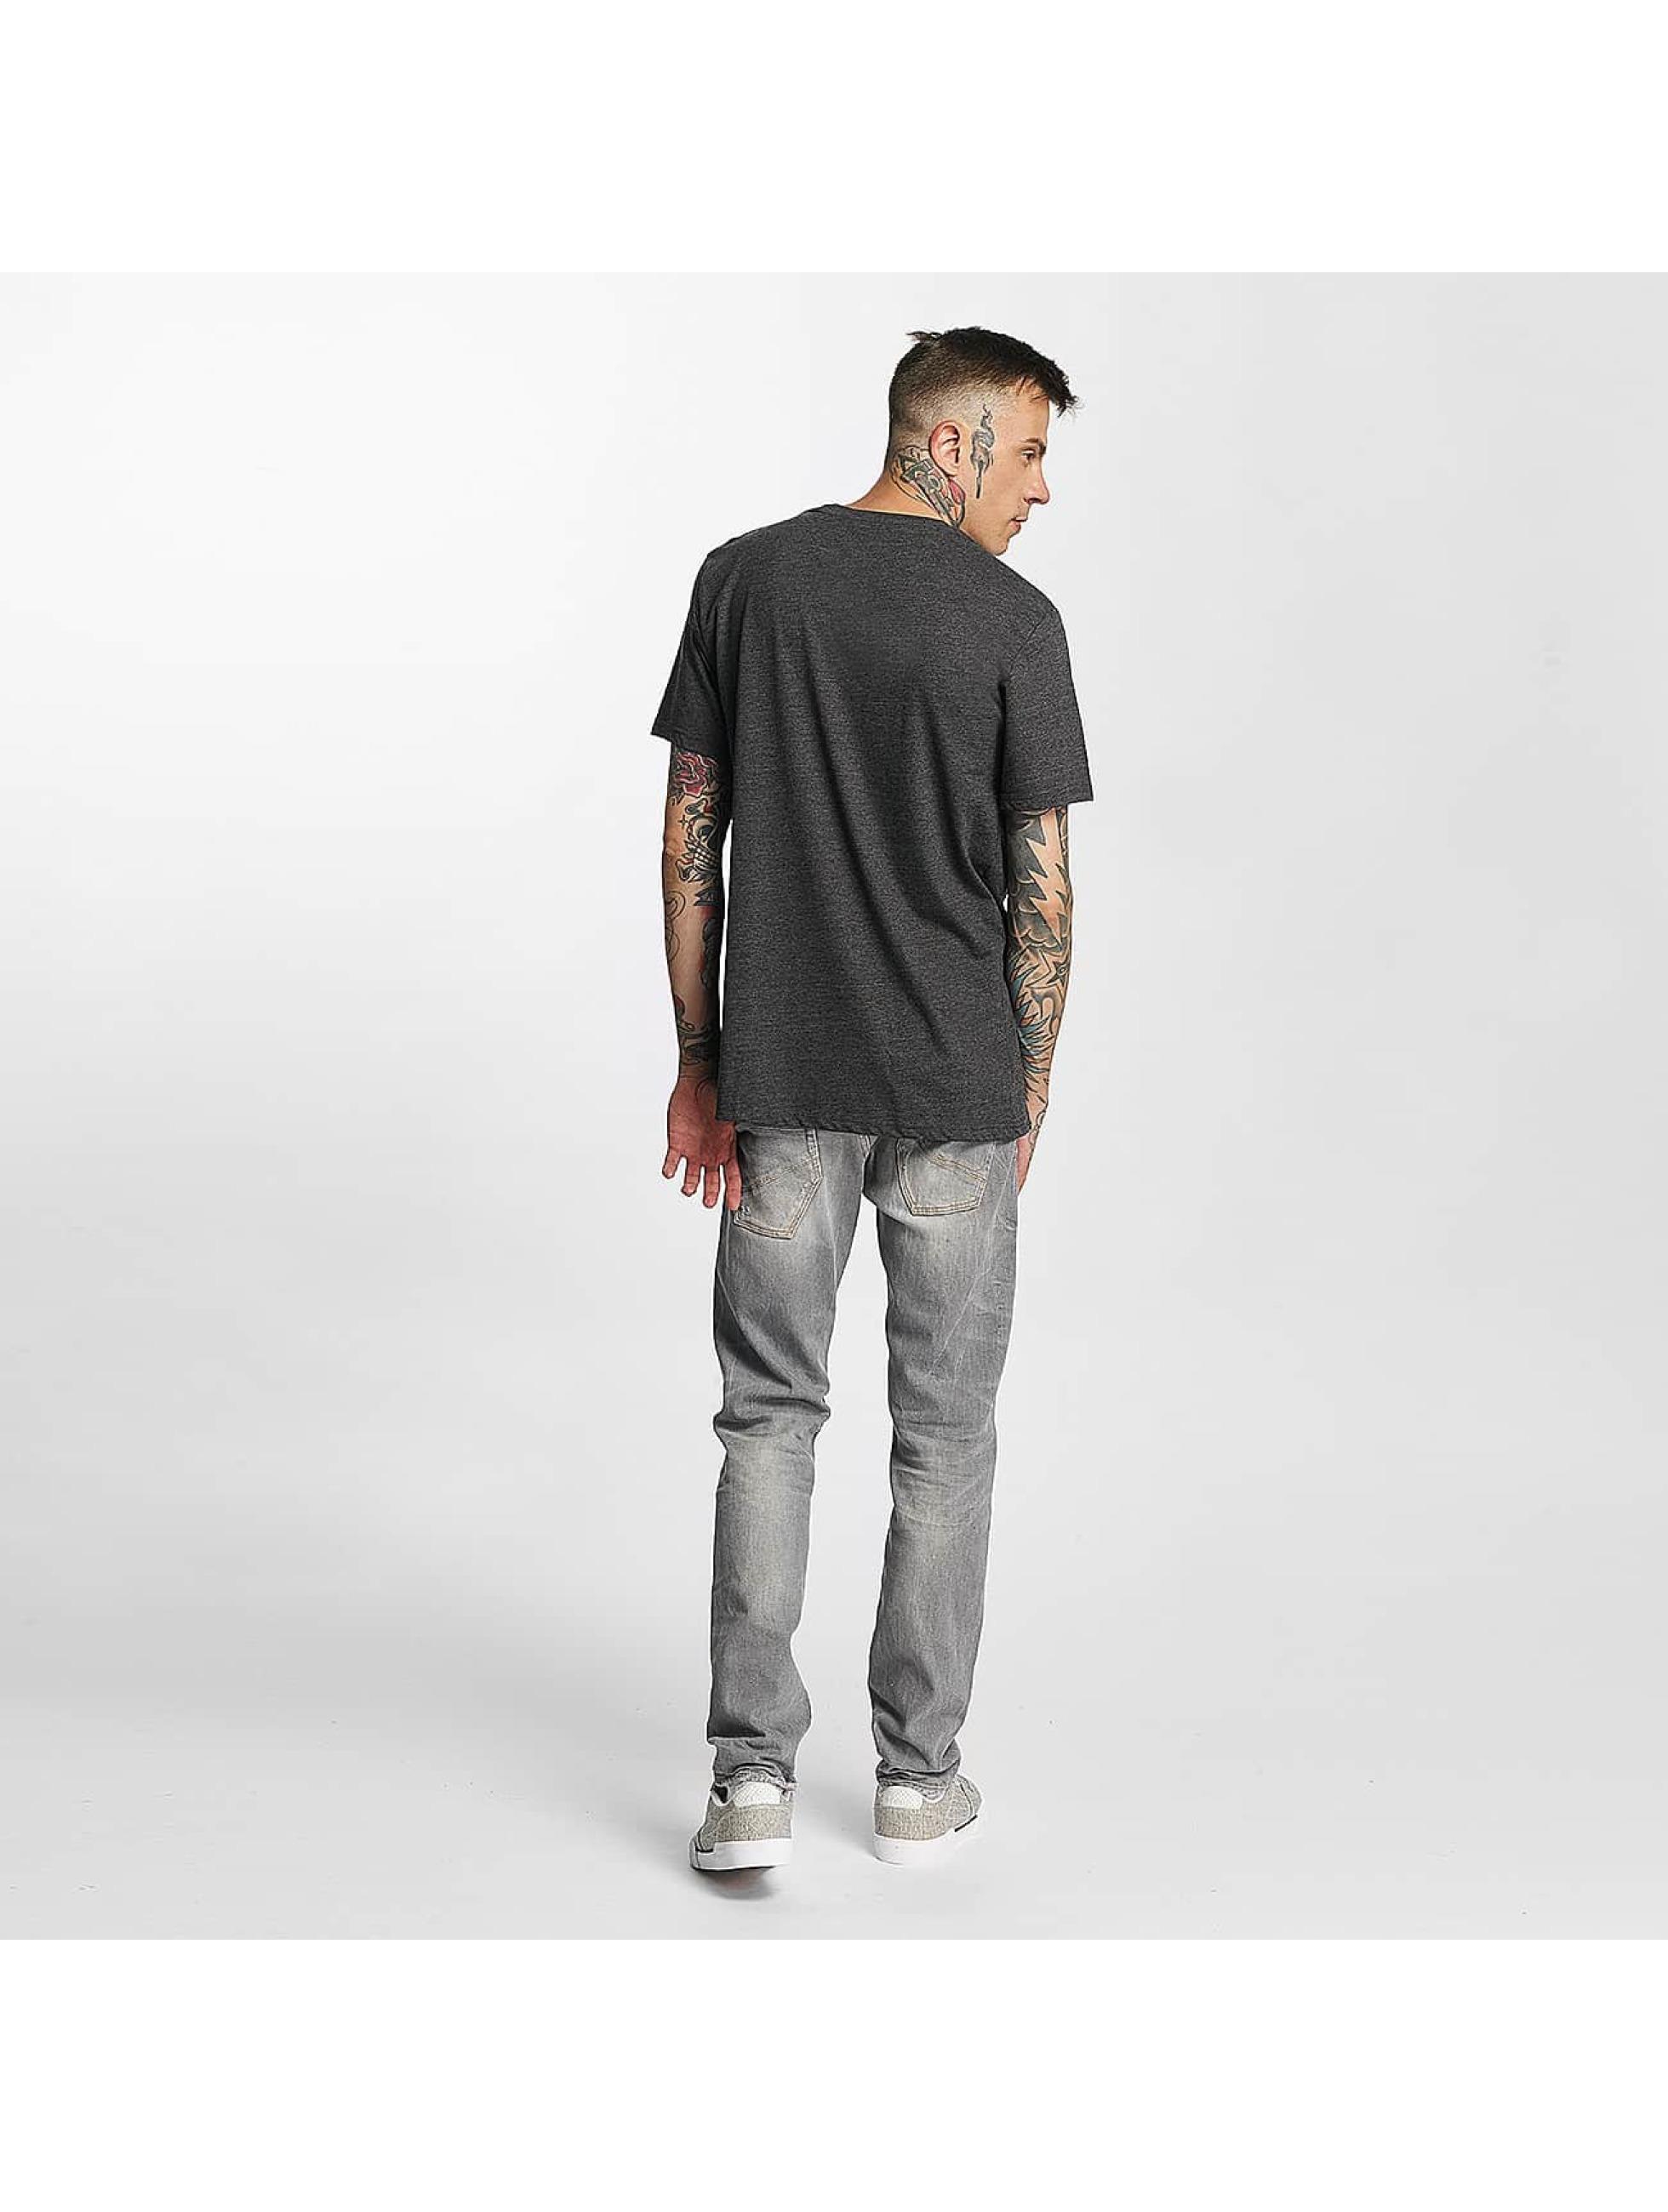 Volcom T-Shirt Pinline Stone Heather black